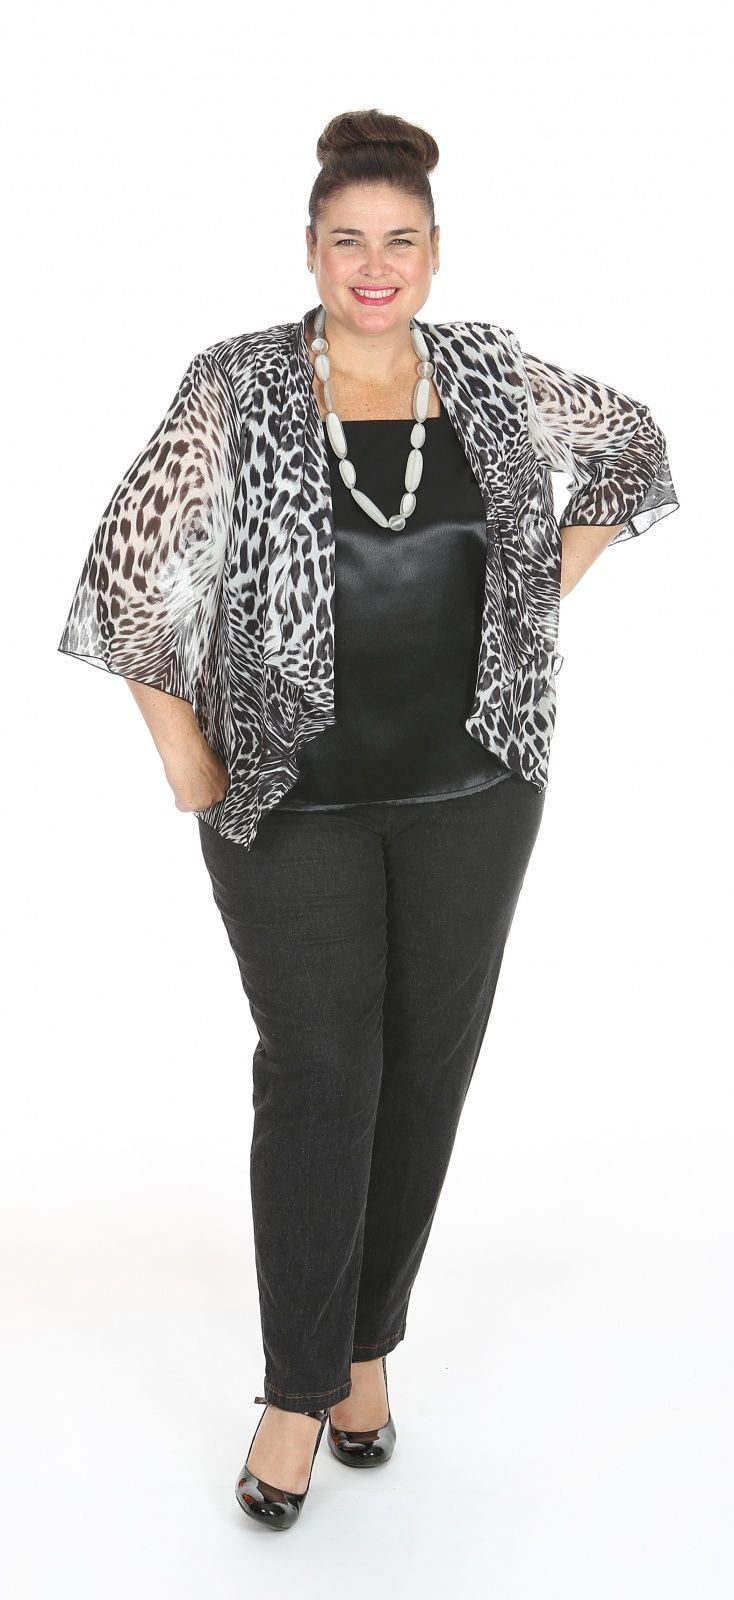 Satin square neck cami Black: A must for the wardrobe. Satin square neck cami matches everything. Fabric: Satin Label: Karl Joseph